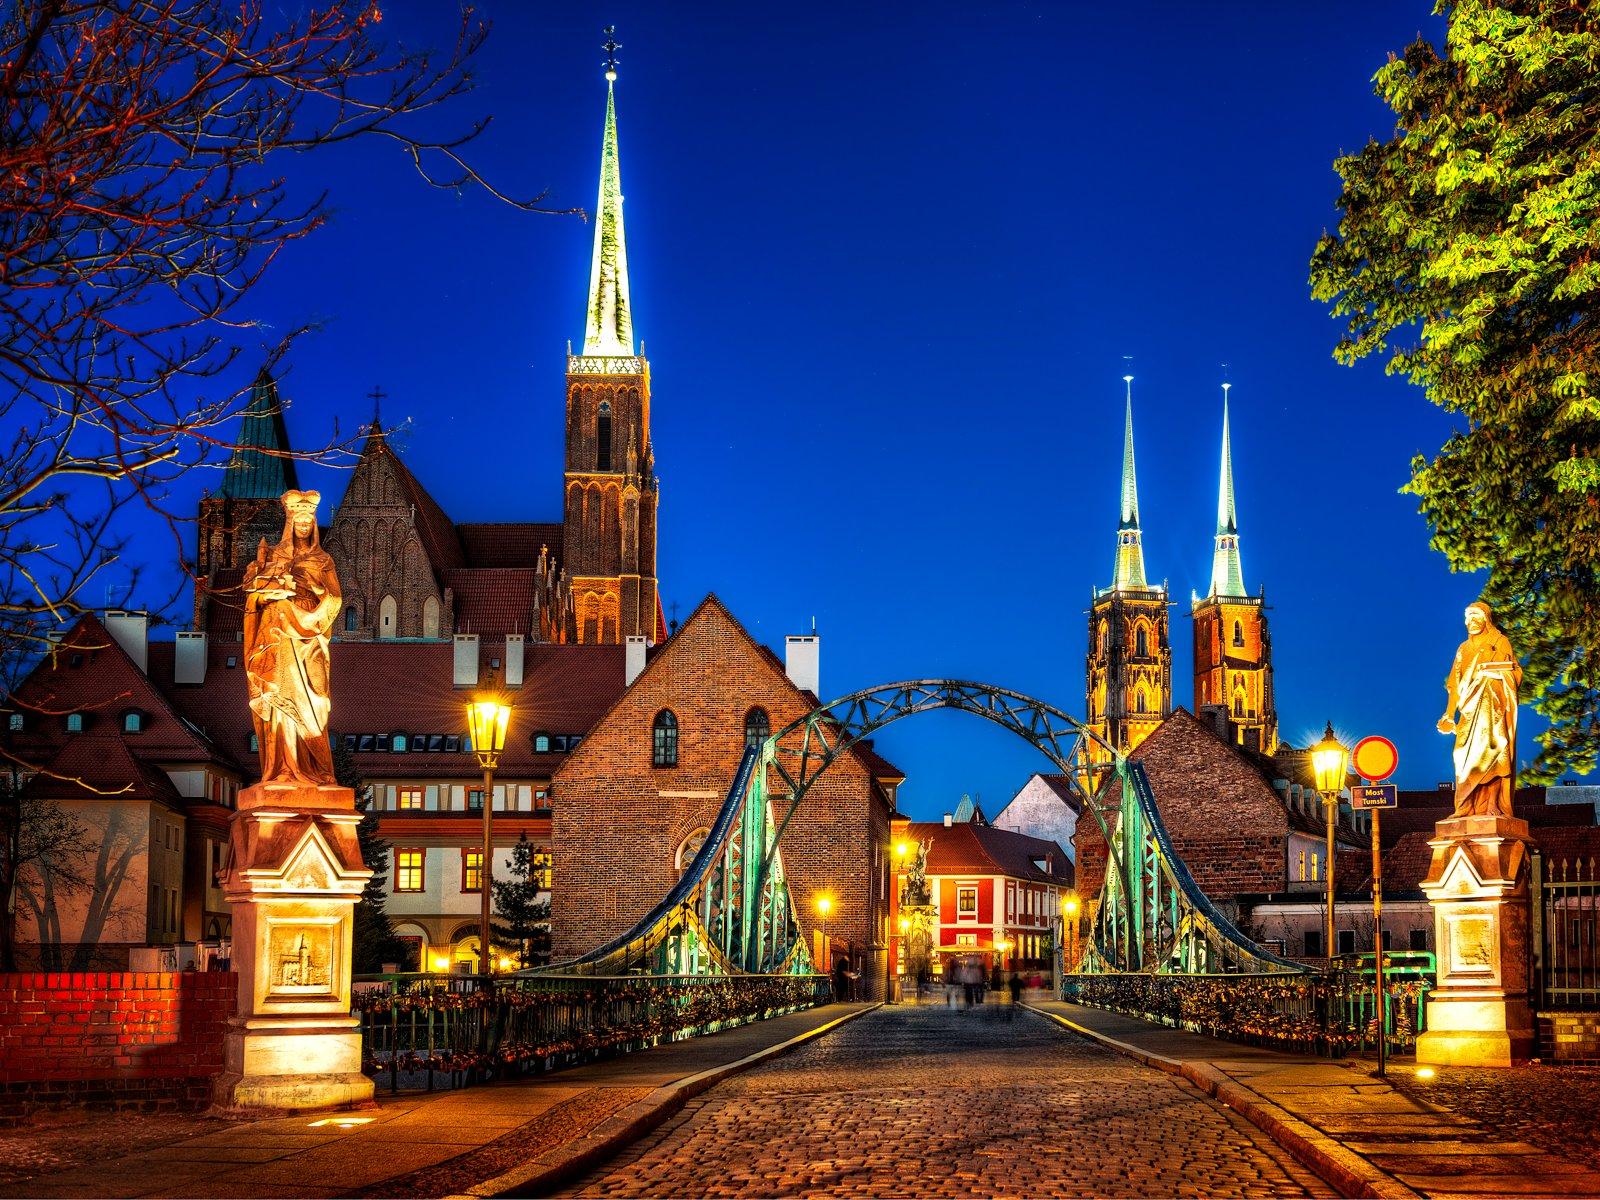 Tumski-brug en kathedraal eiland in Wroclaw, Polen